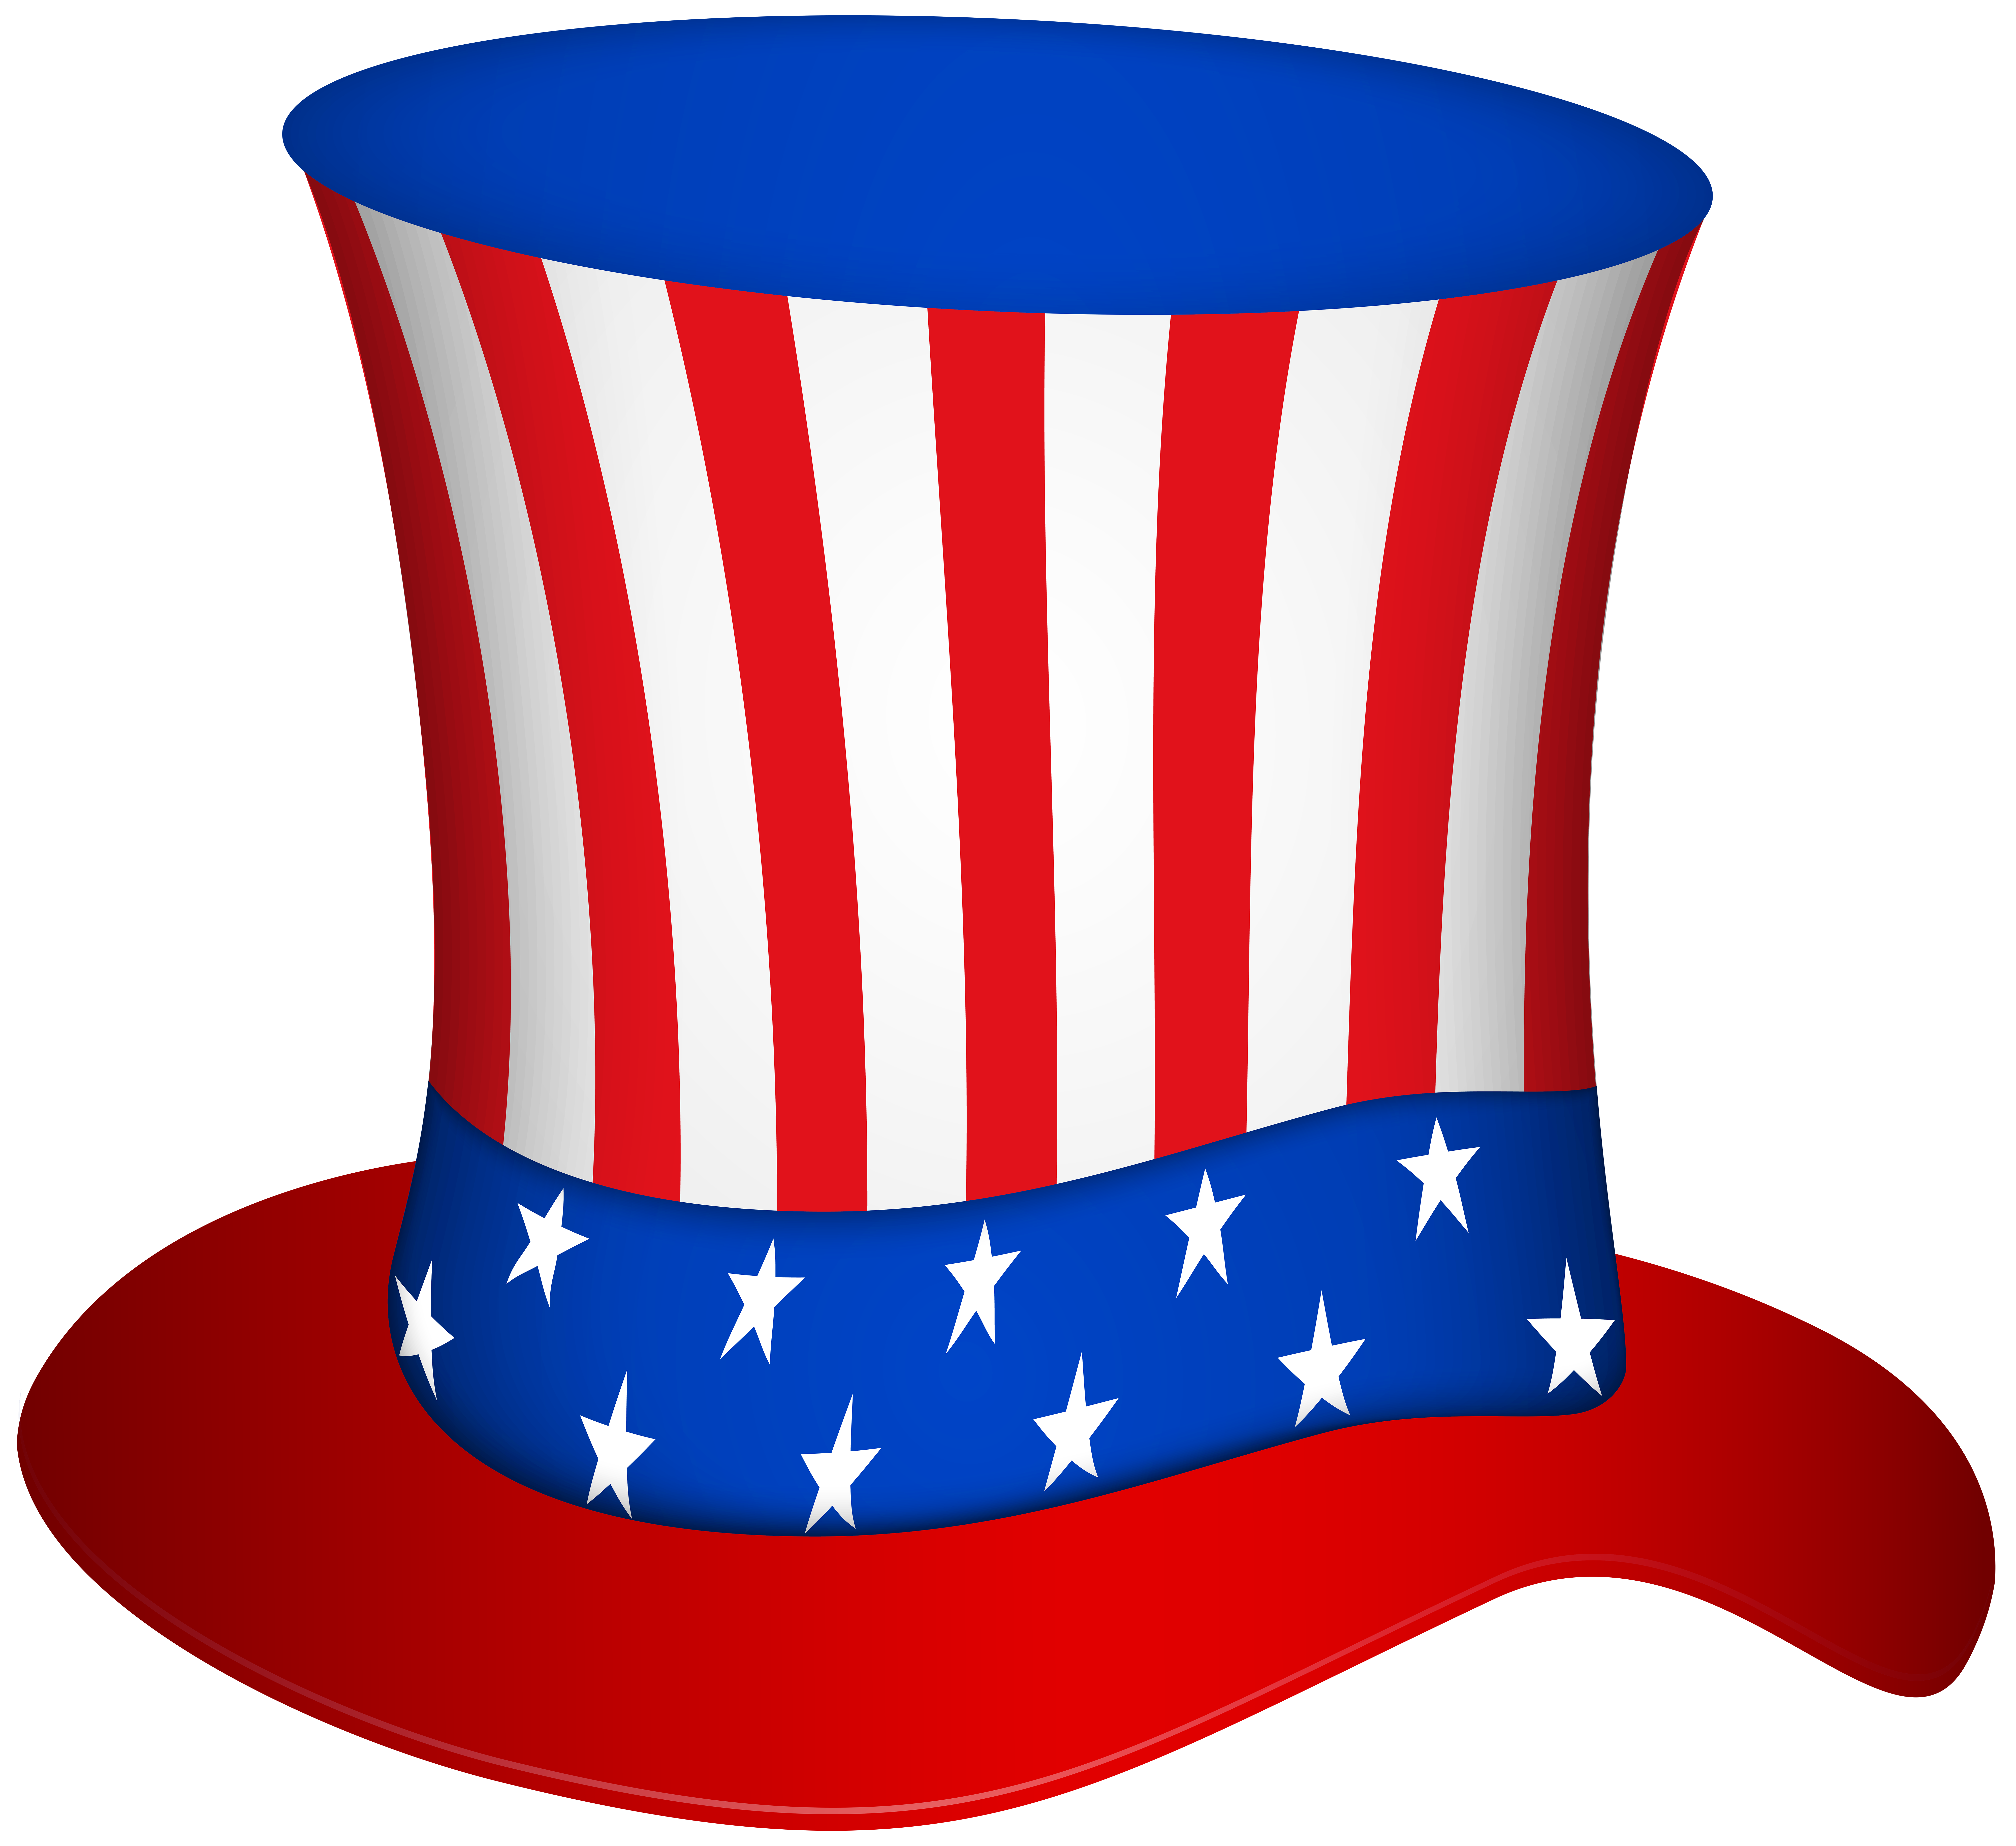 8000x7325 Uncle Sam Hat Png Transparent Clip Art Imageu200b Gallery